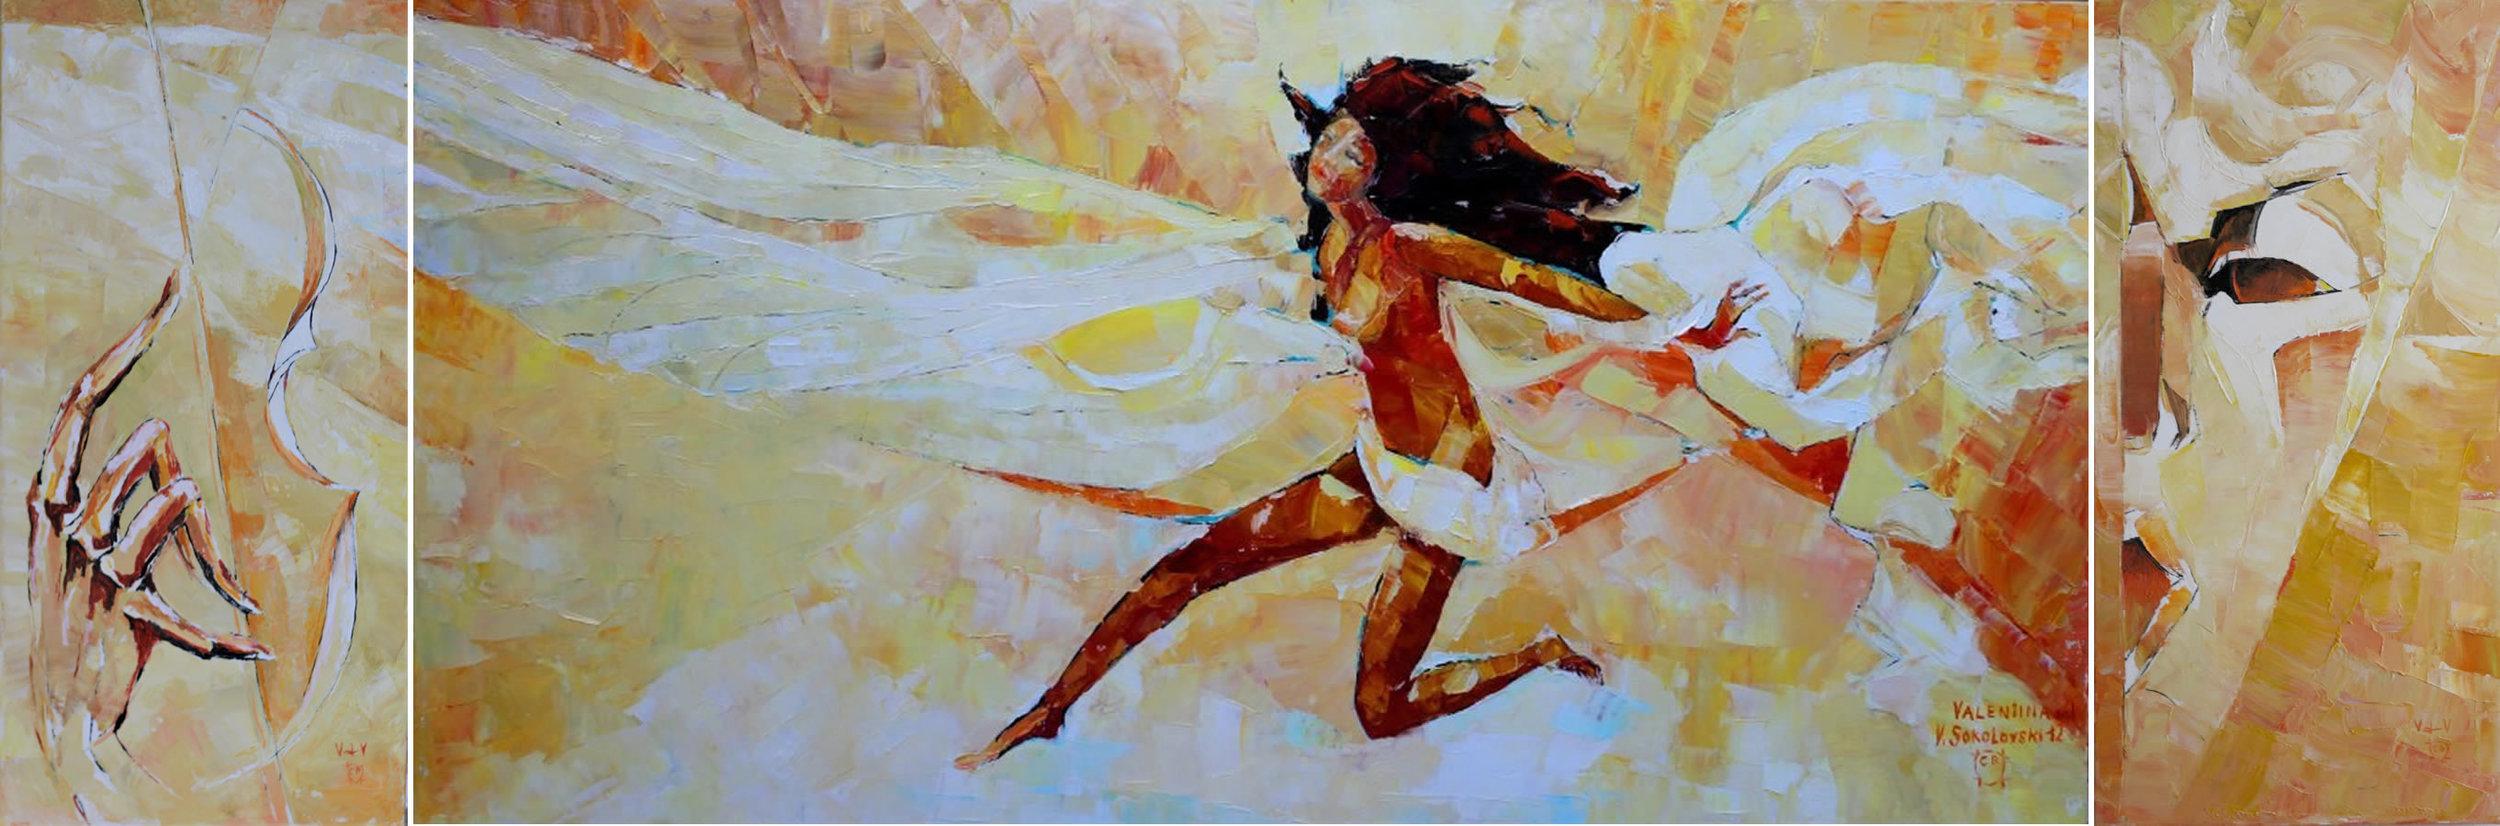 VALERI SOKOLOVSKI Phantom of Inspiration Triptych Original Oil 24 X 12   48 X 24   24 X 12